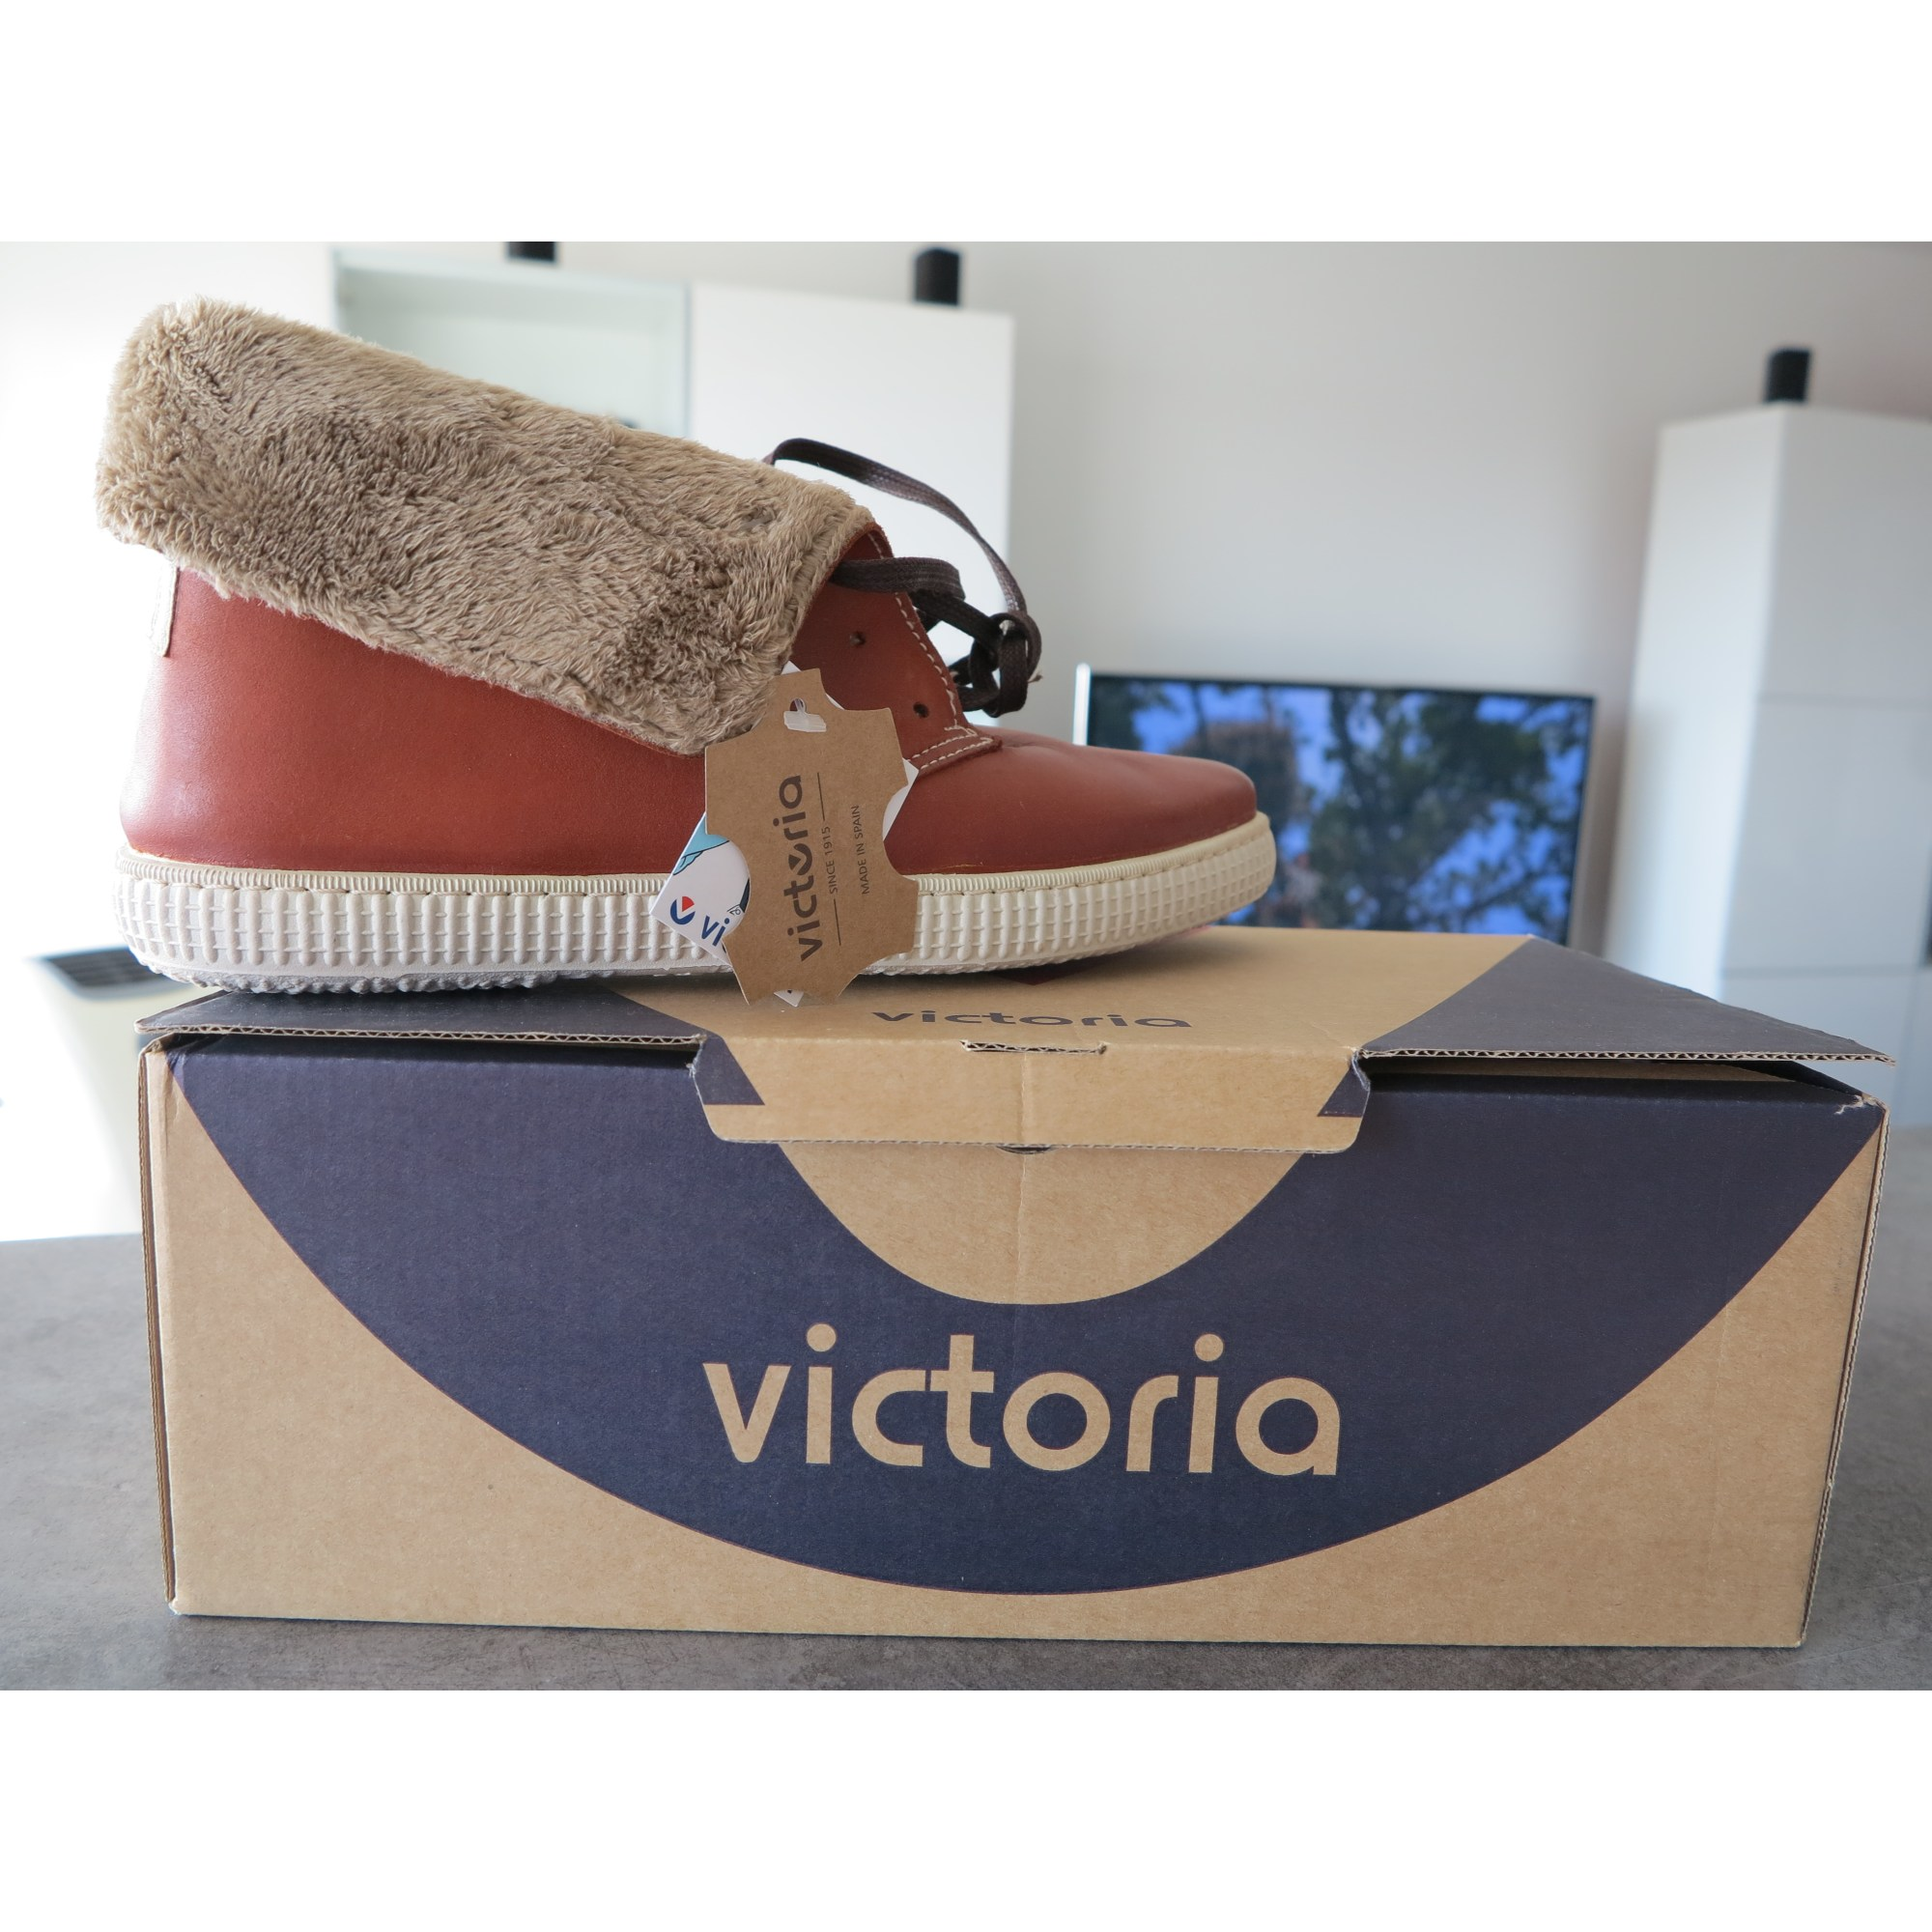 2010 Victoria Victoria Fourrure Chaussures Victoria 2010 Chaussures Fourrure Chaussures W29IEHD